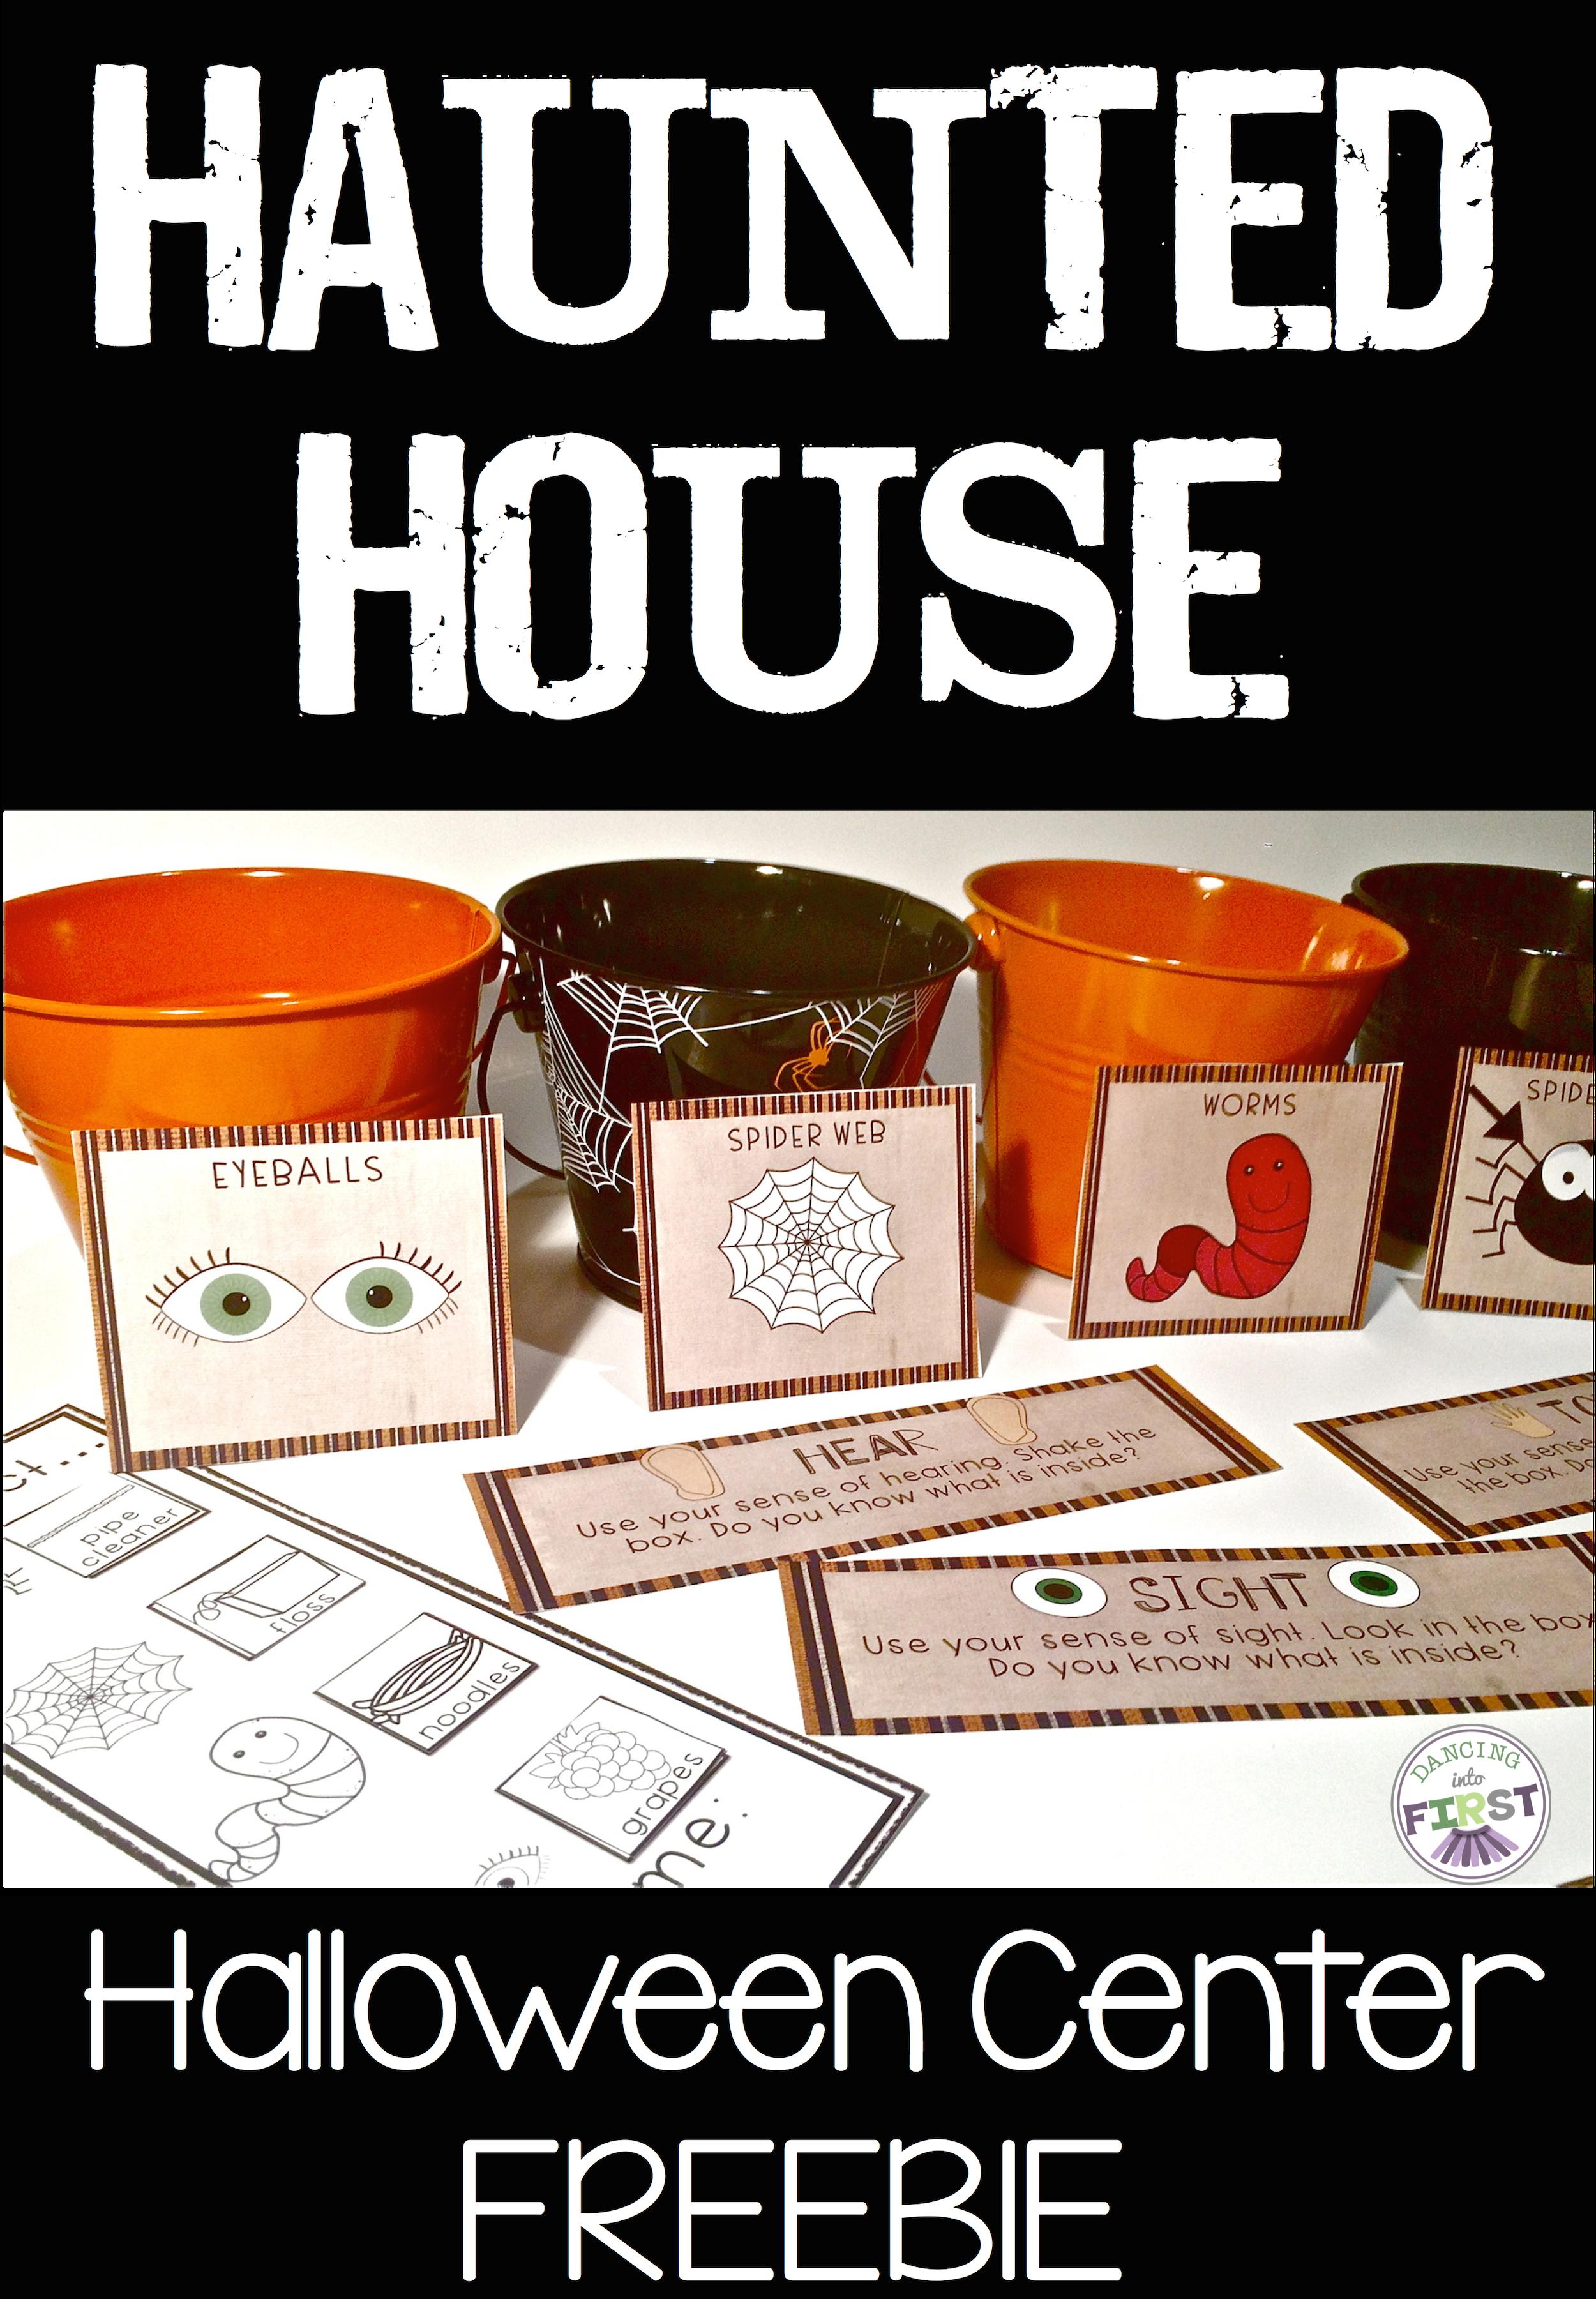 Halloween Center Haunted House Using Senses Freebie